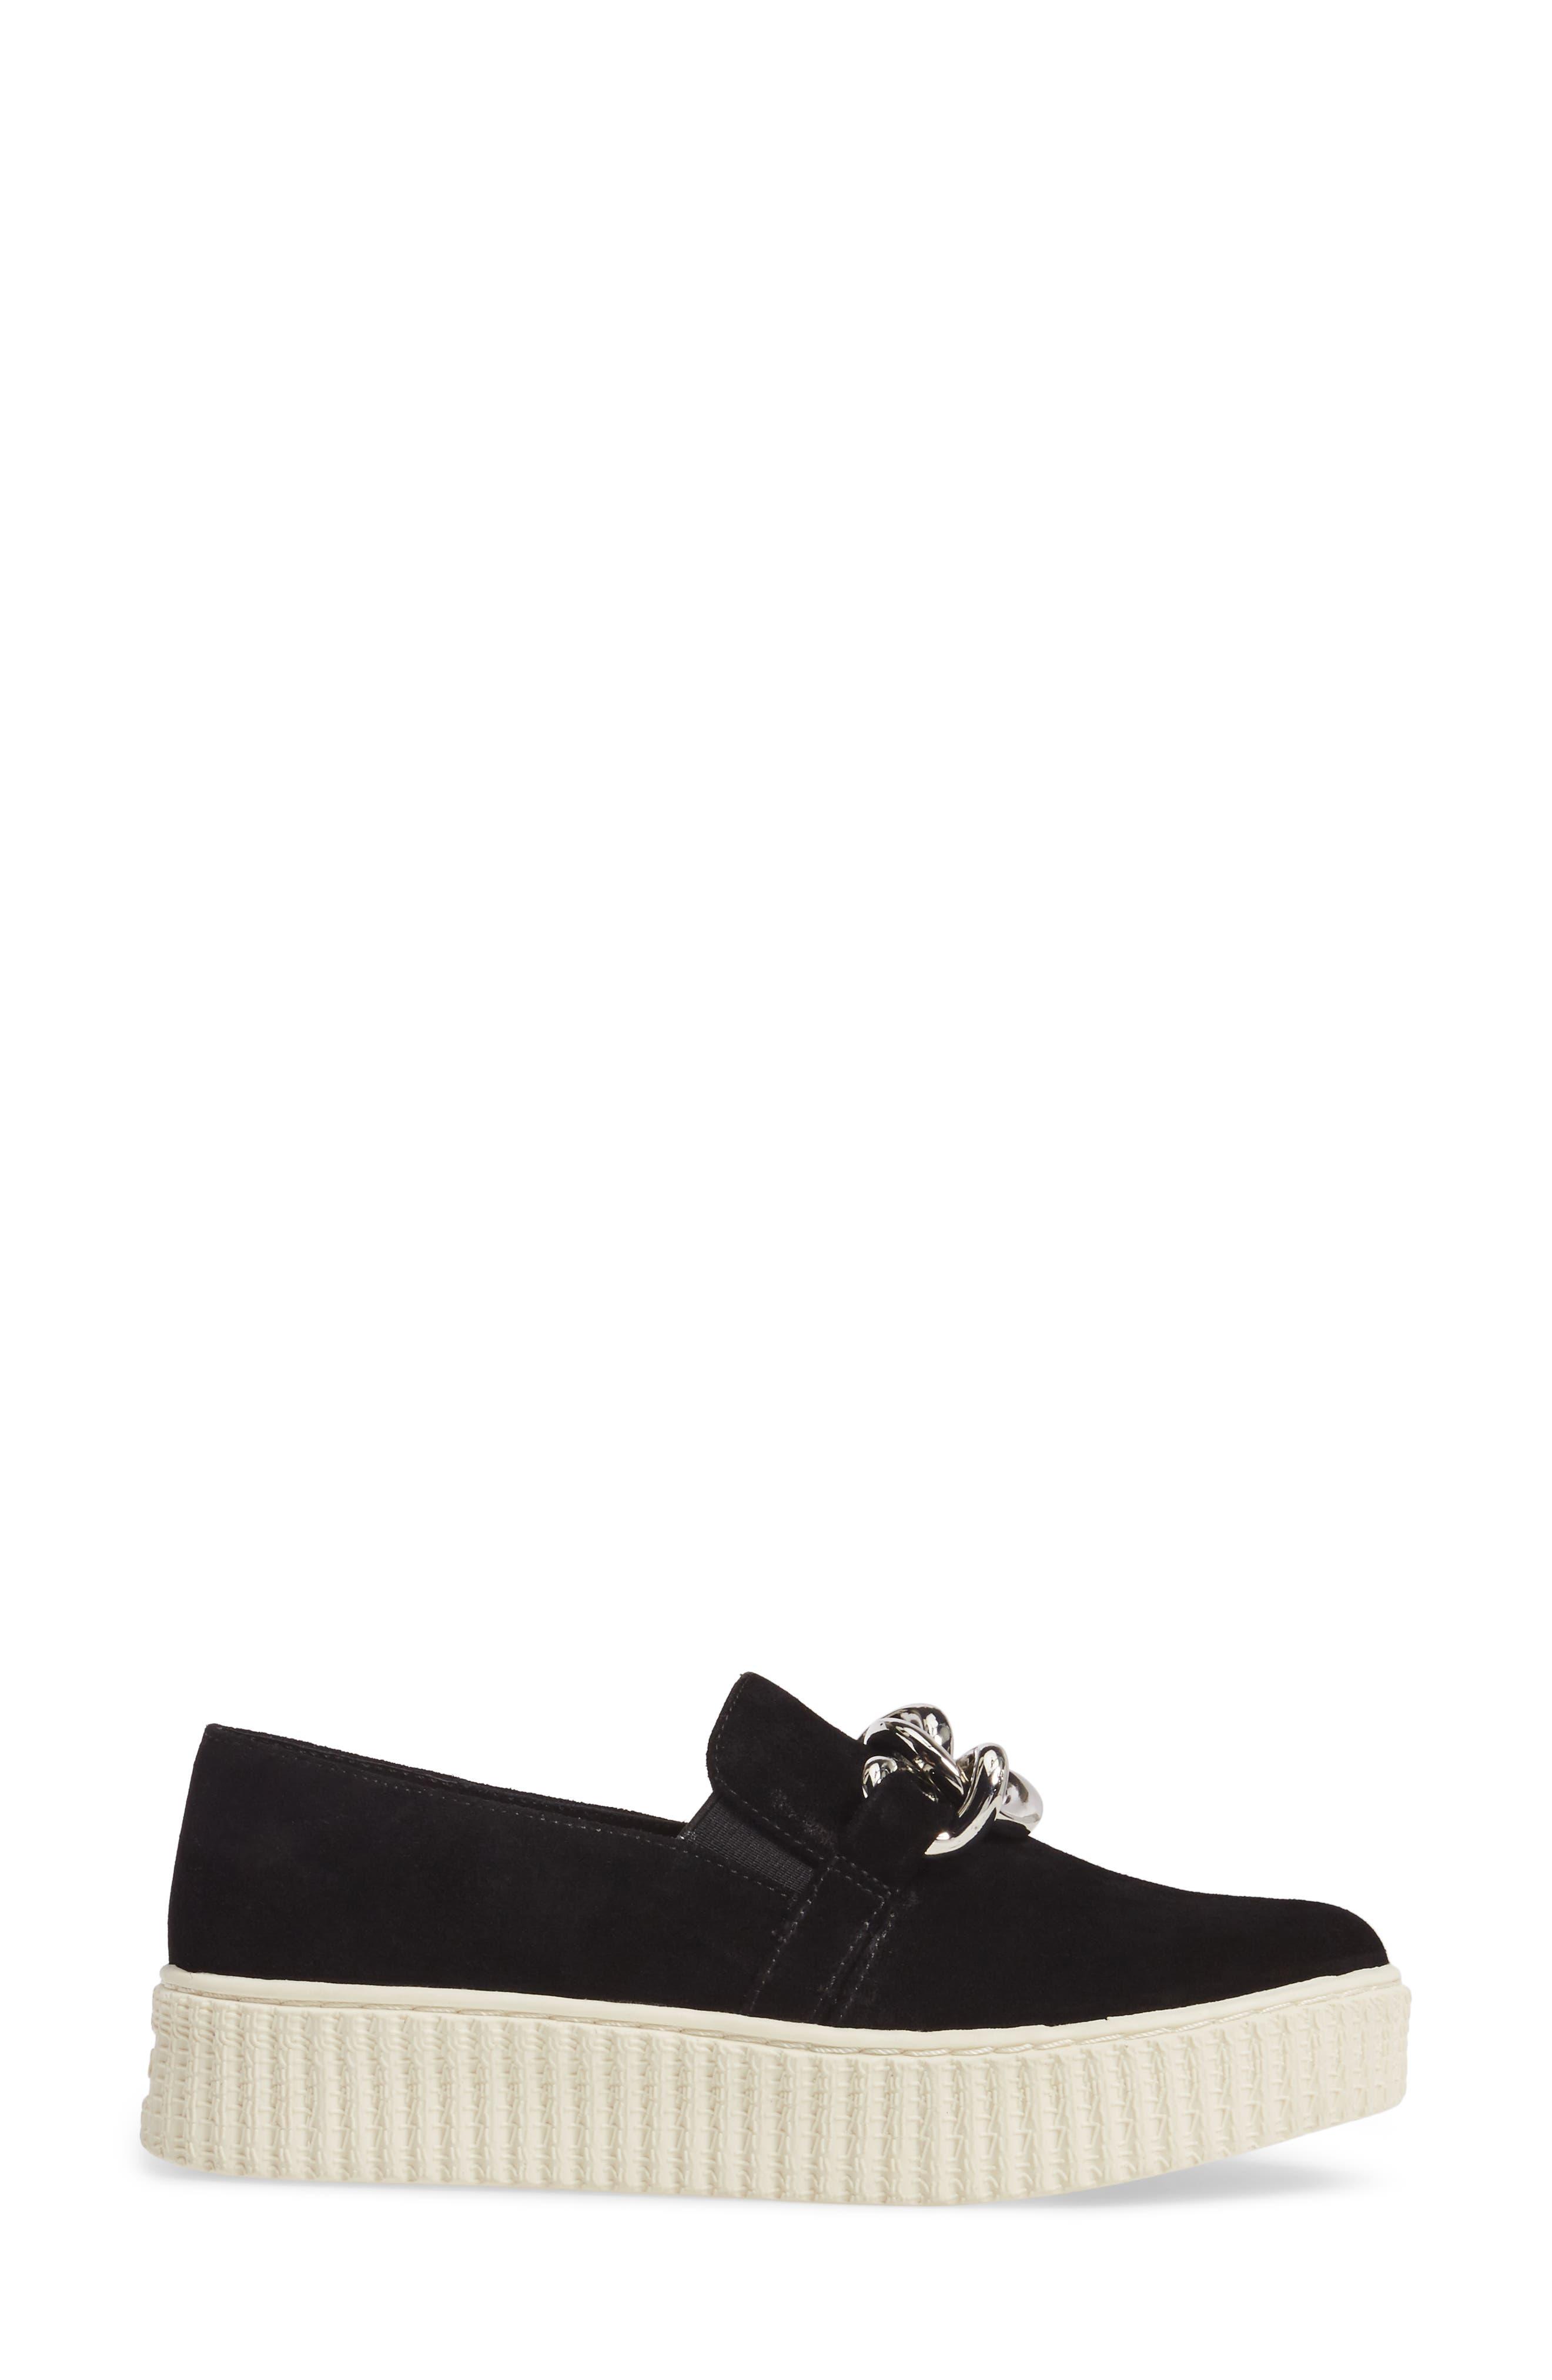 Roberta Platform Sneaker,                             Alternate thumbnail 3, color,                             Black Suede